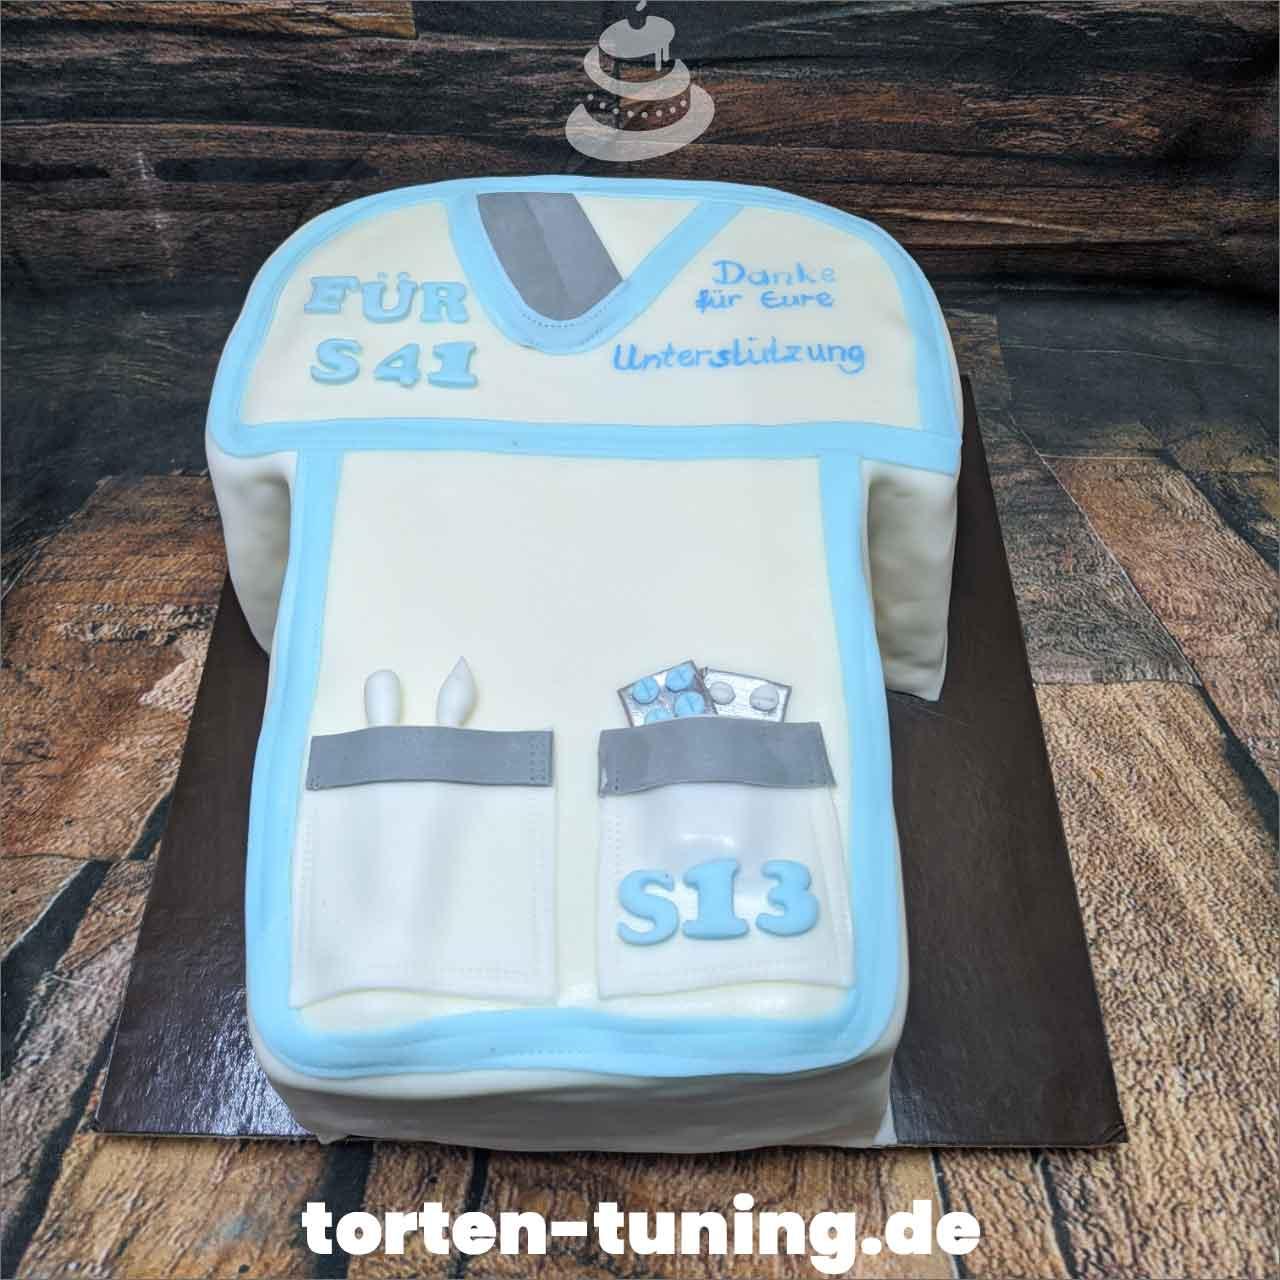 Krankenschwester Kittel Obsttorte Geburtstagstorte Motivtorte Torte Tortendekoration Torte online bestellen Suhl Thüringen Torten Tuning Sahnetorte Tortenfiguren Cake Topper